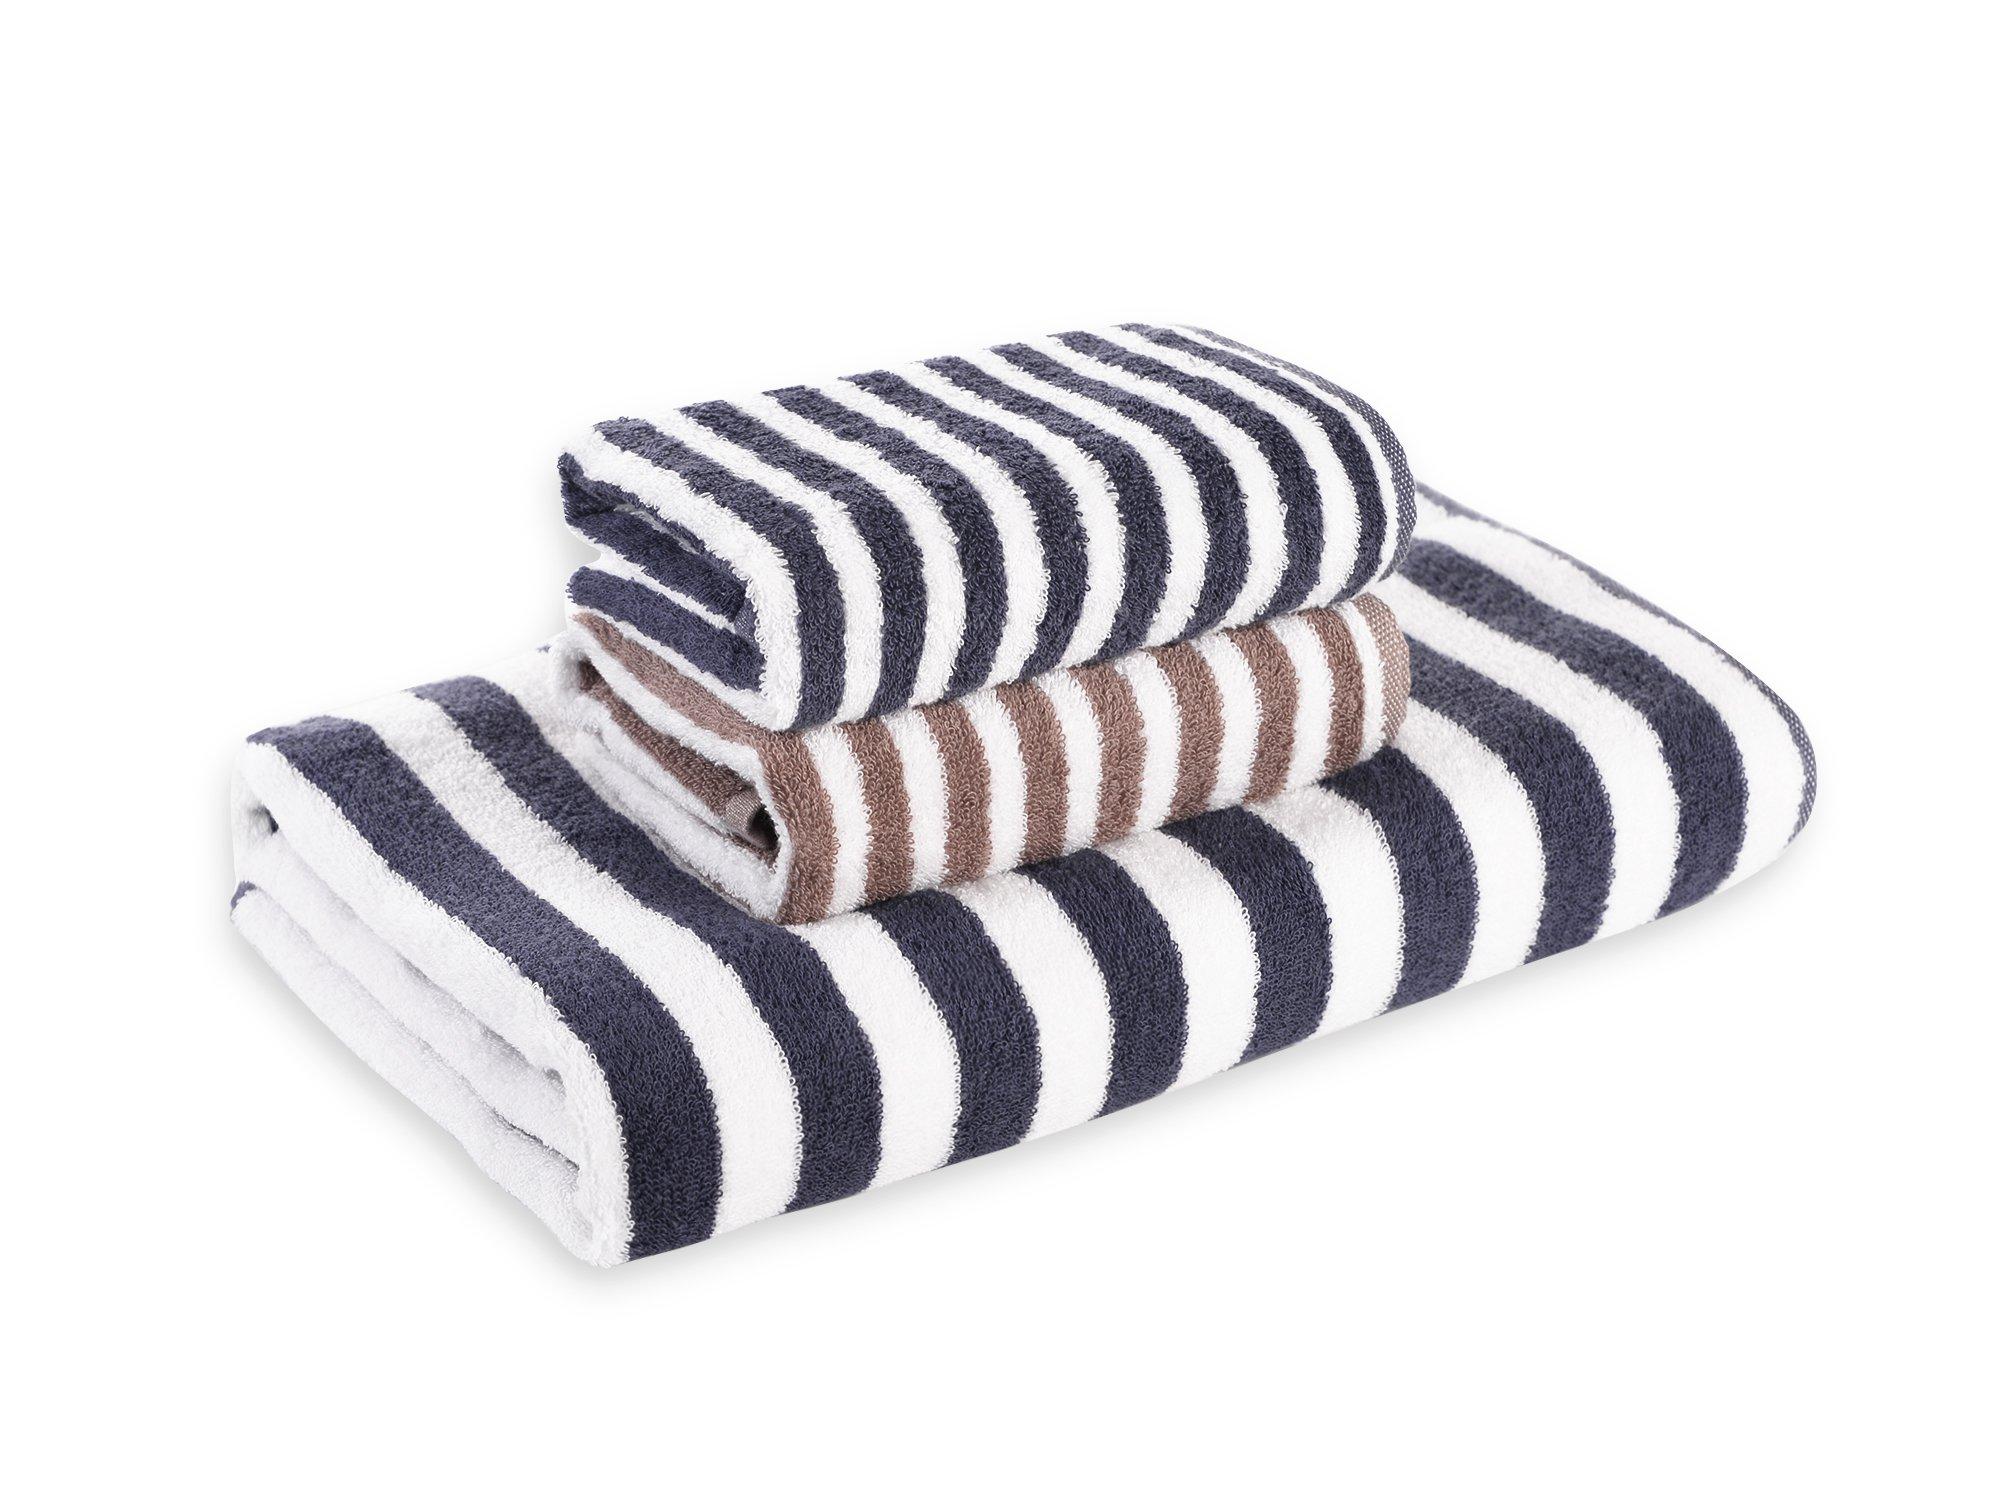 Worboo 3-Piece Bamboo Fiber Towel Set (2 Pieces Hand Towel set & 1 Pieces Bath Towel) Eco Friendly Gift Package (Blue+Brown)